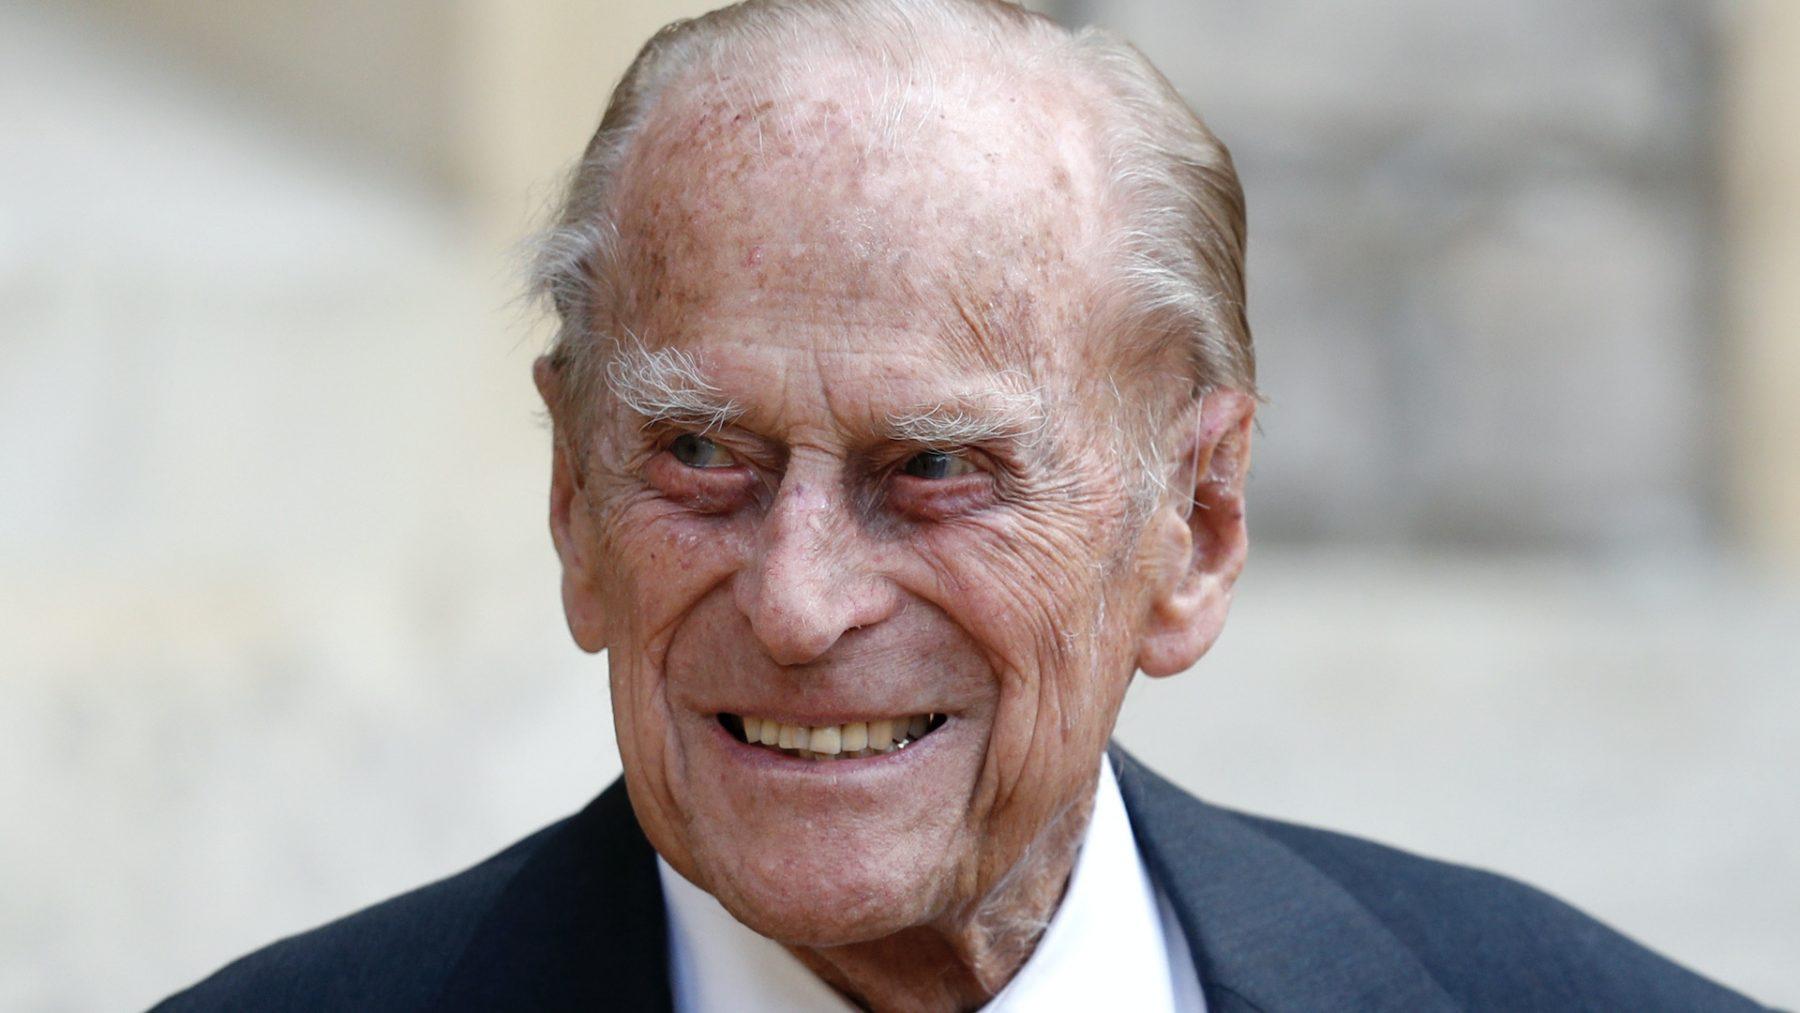 prins Philip overleden